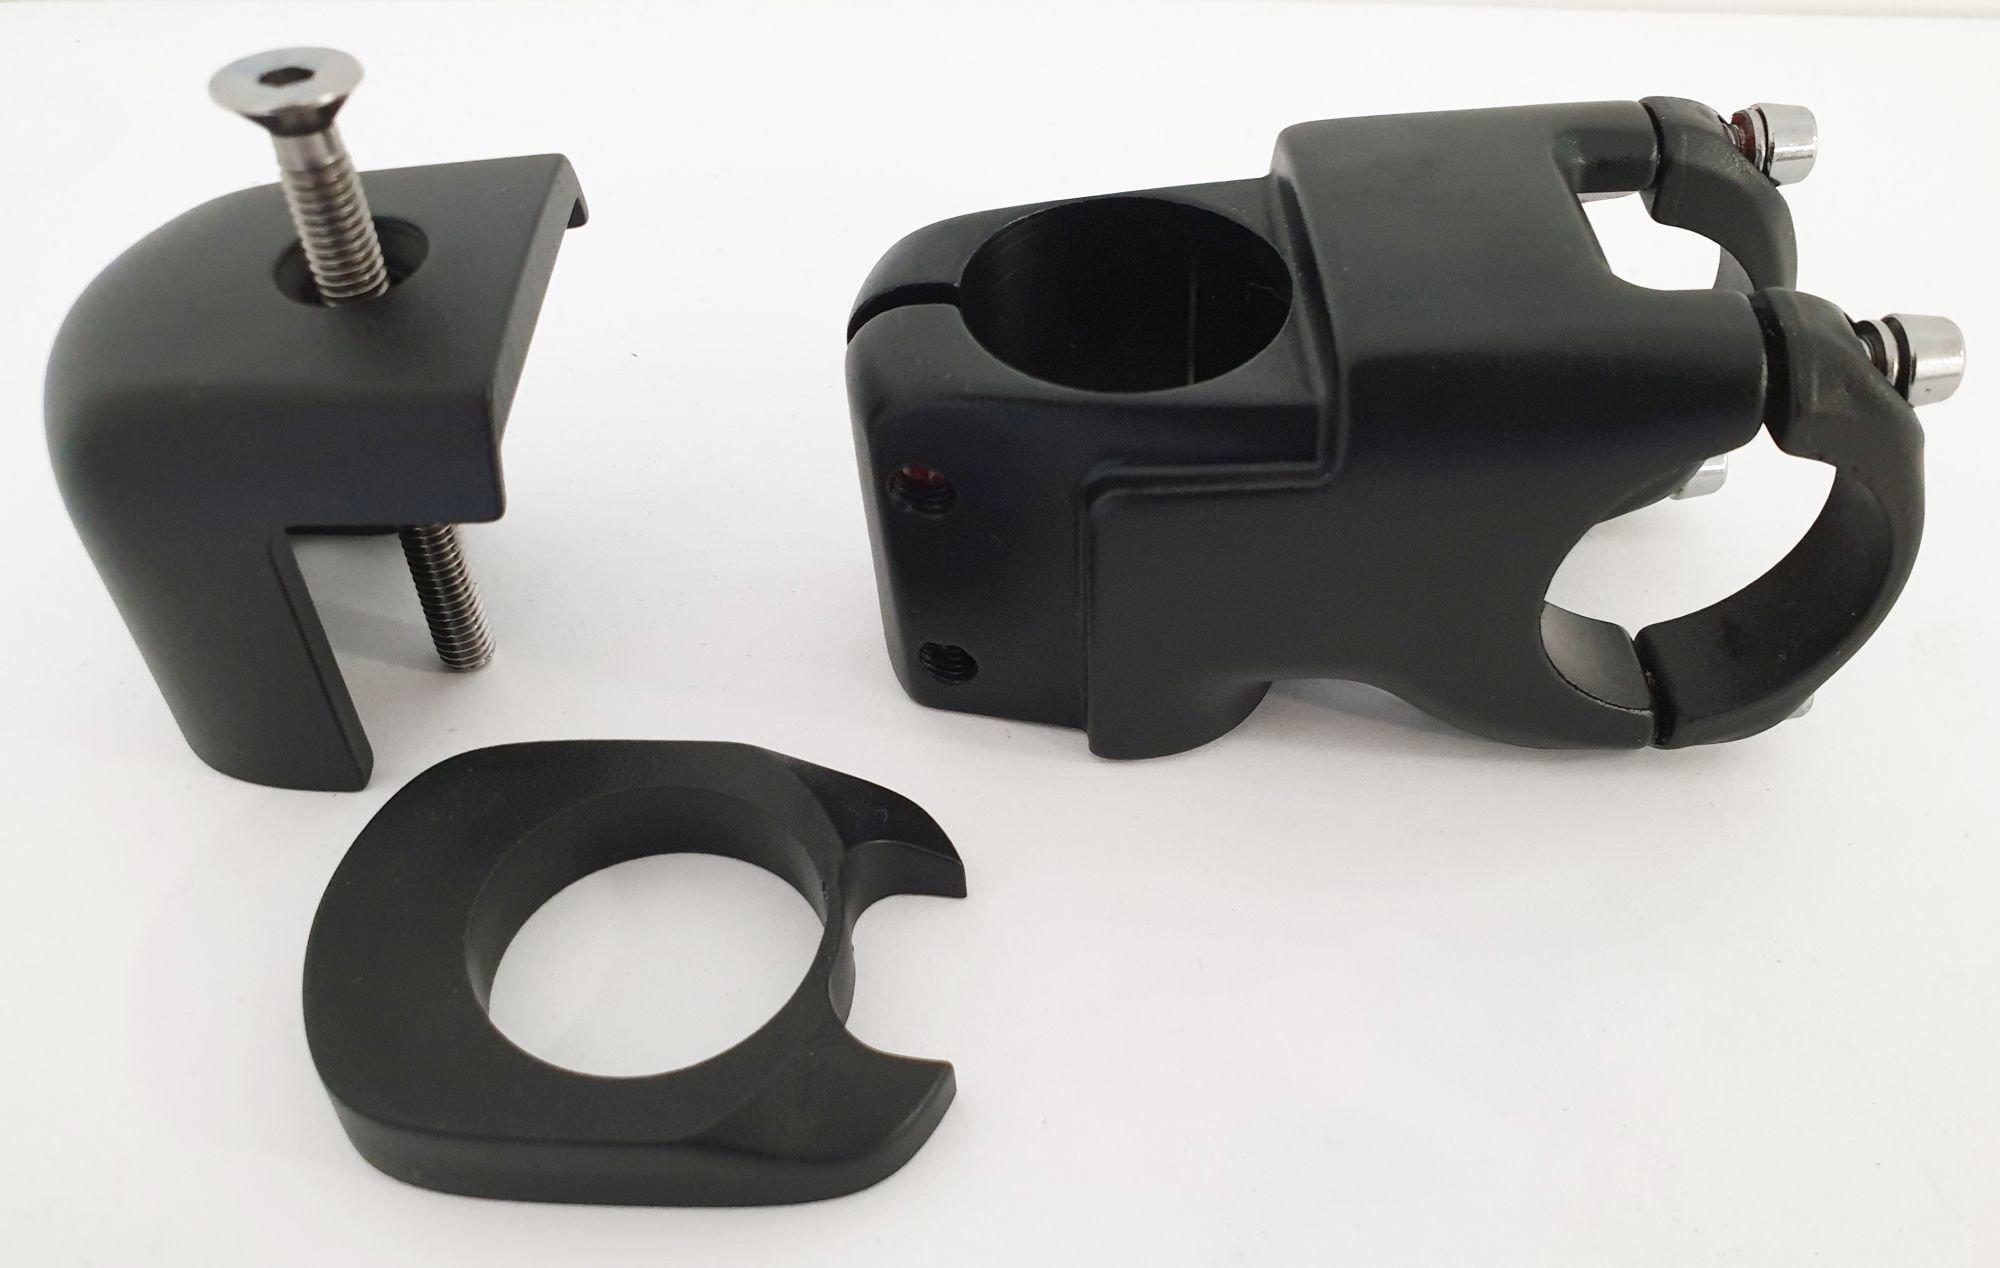 vorbauten/Vorbauten: Kalloy Vorbau AS-MTB-i 31828650mm